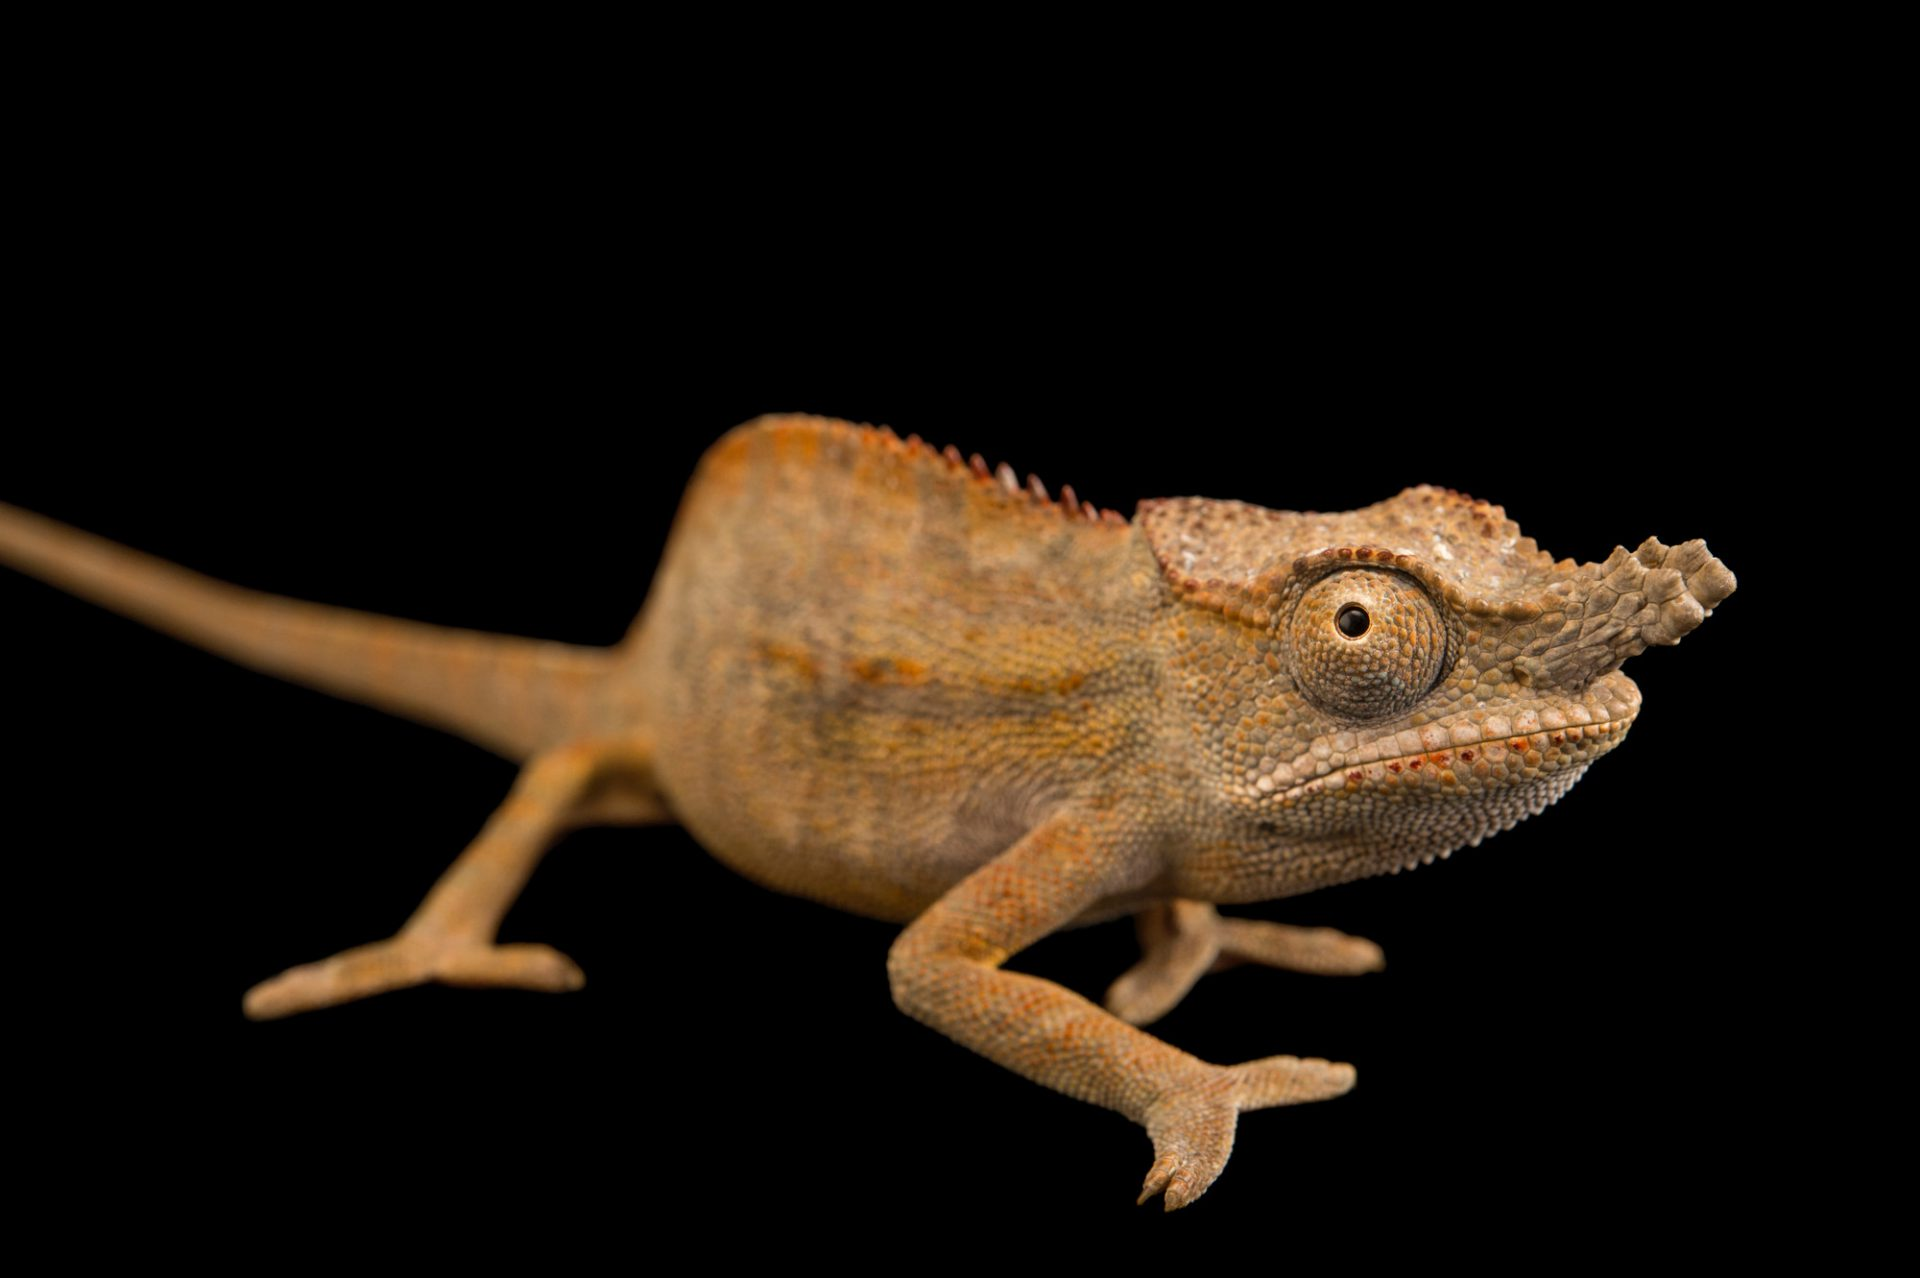 Photo: An endangered lesser chameleon (Furcifer minor) in Madagascar.